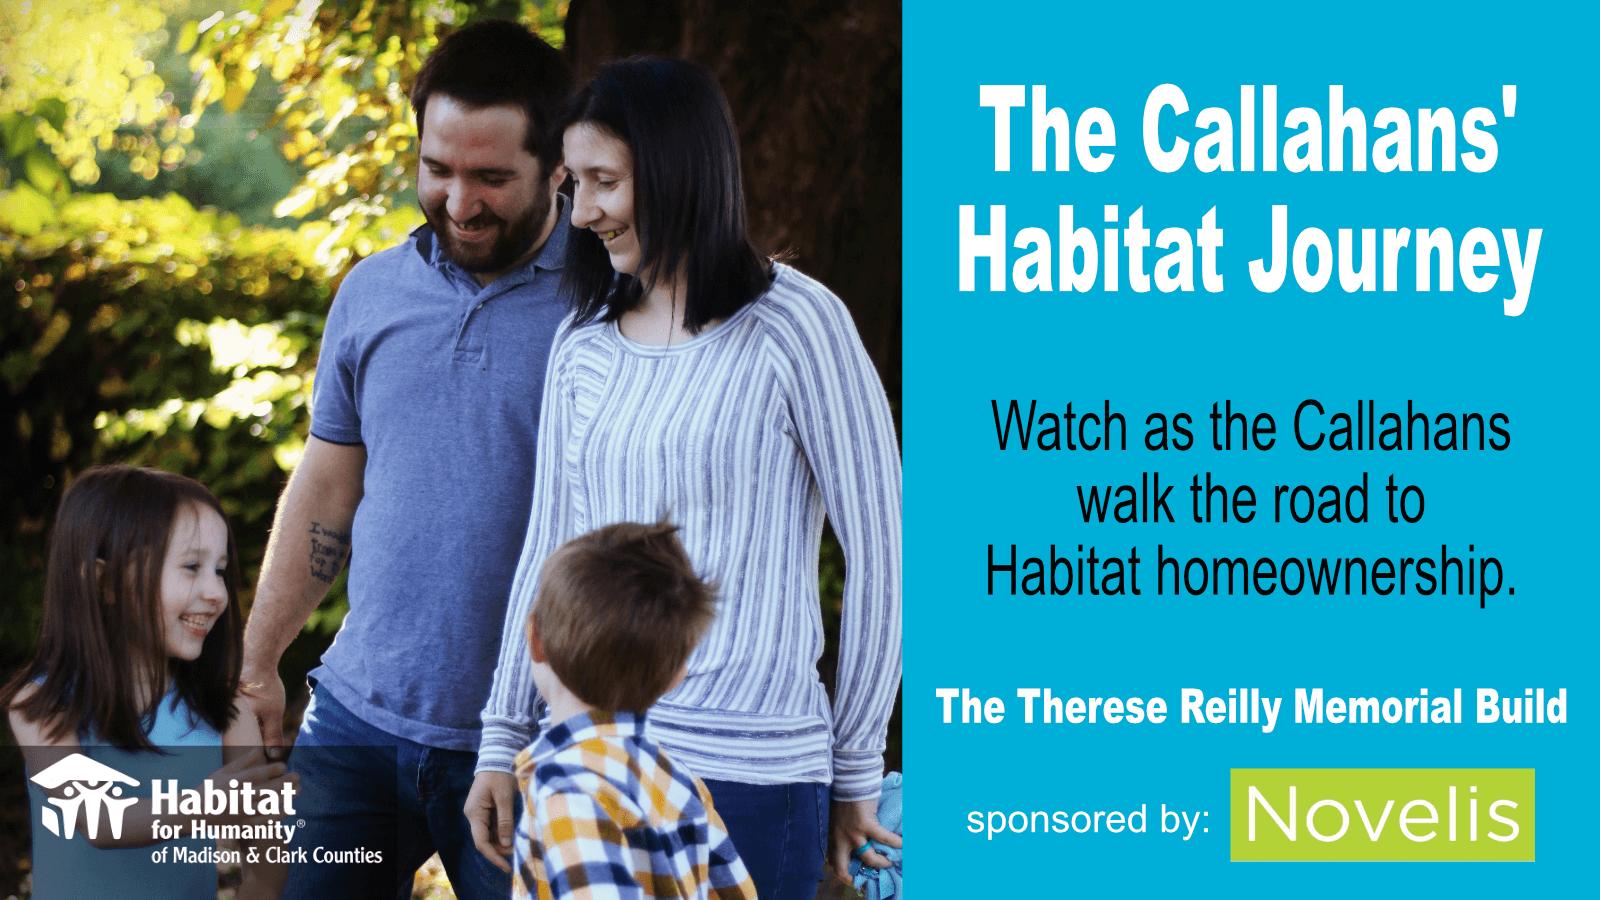 The Callahans' Habitat Journey